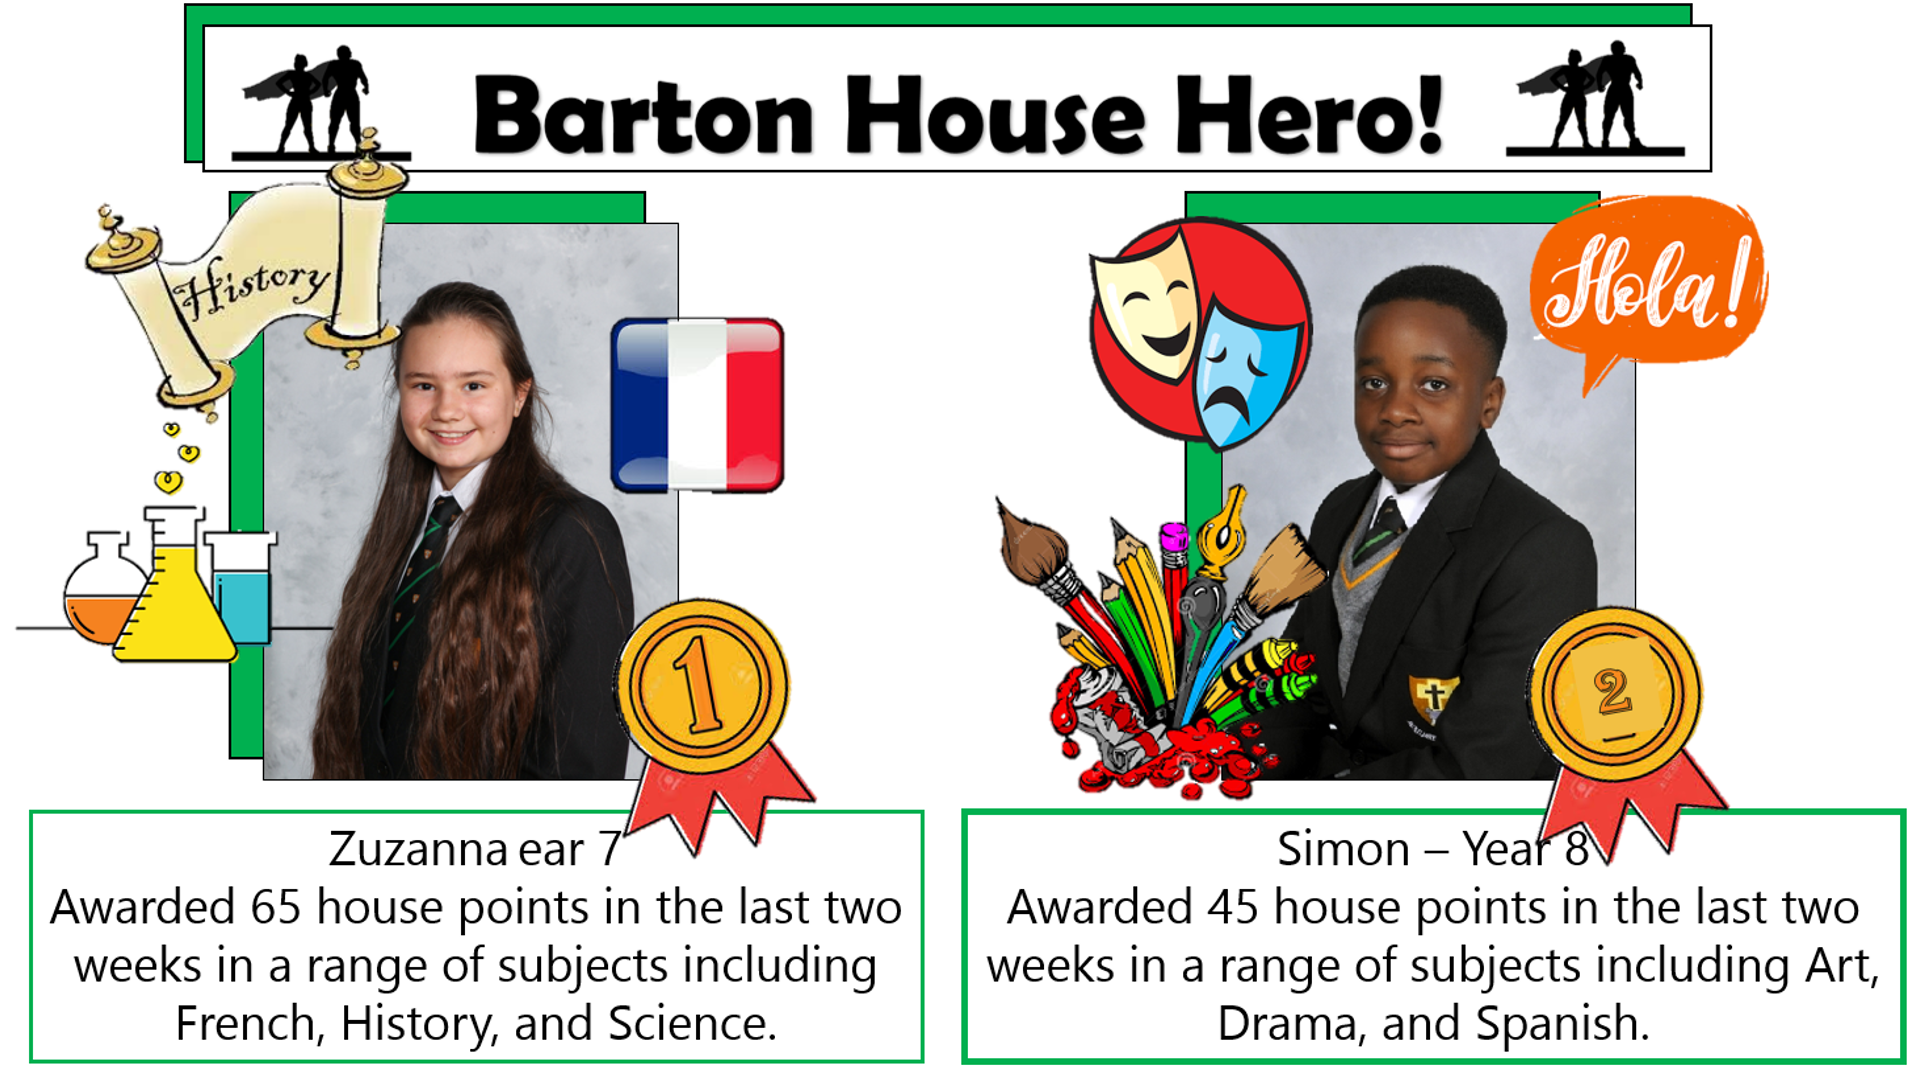 Barton House Hero